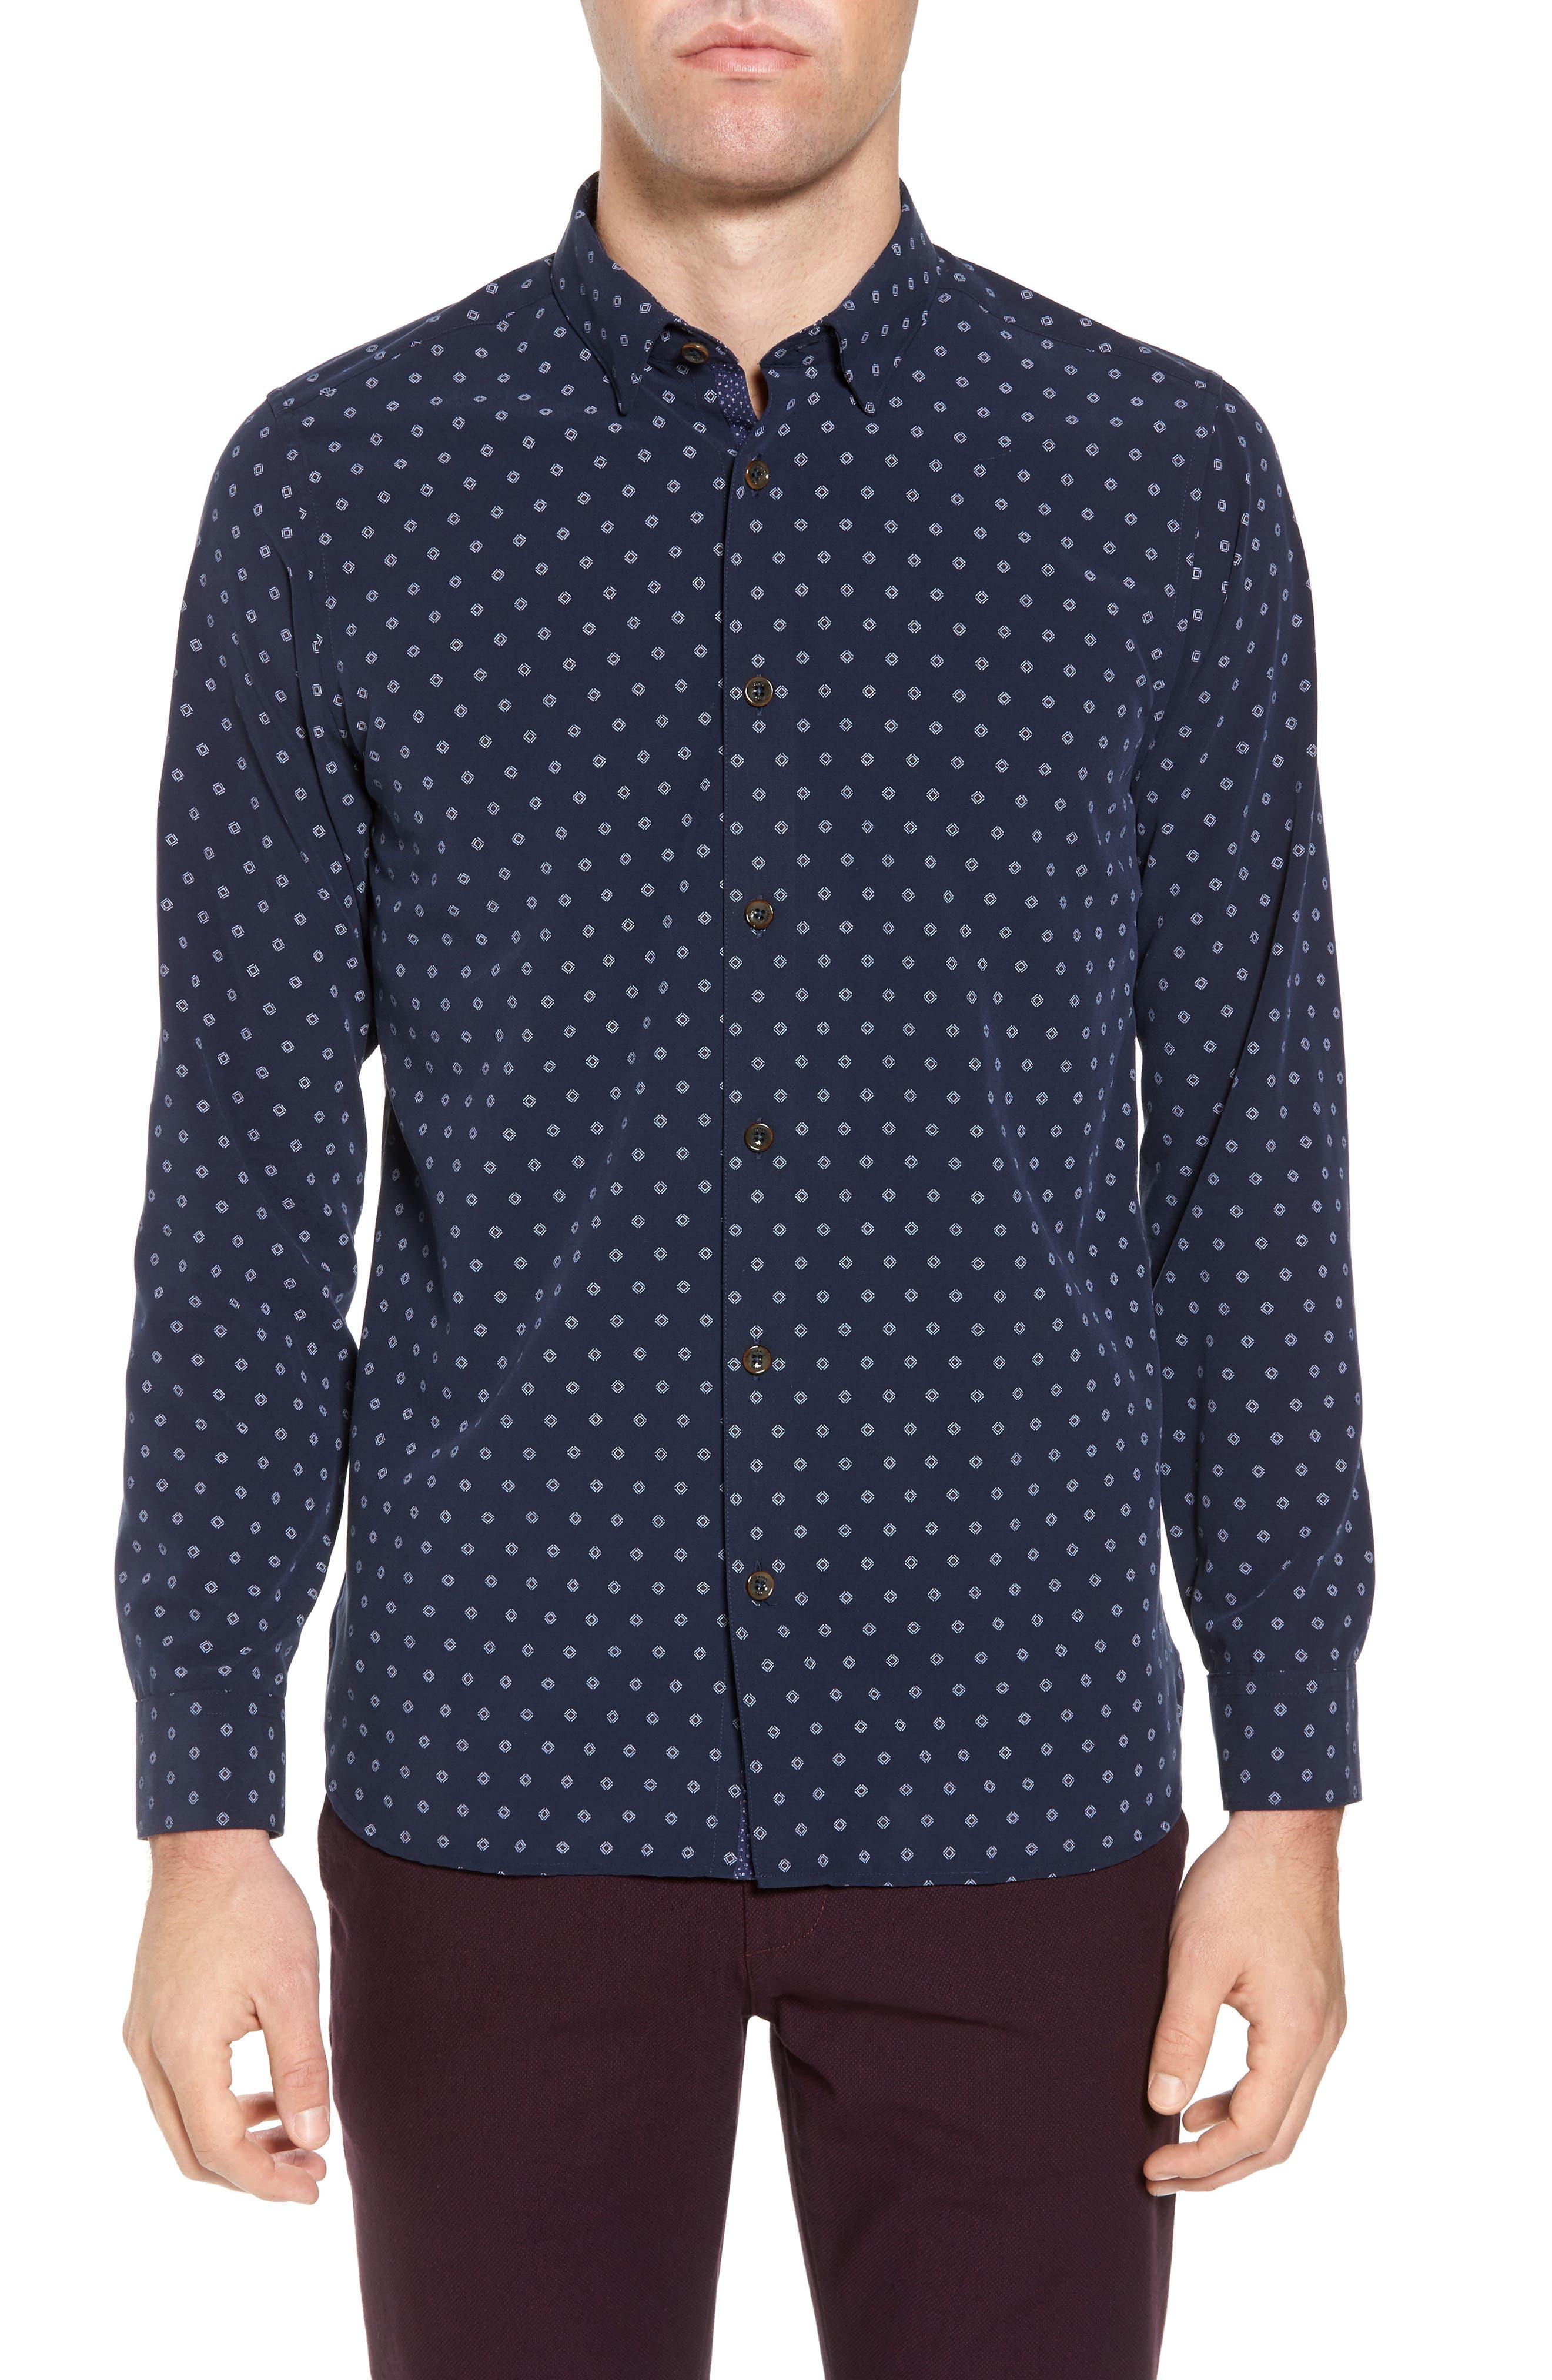 TED BAKER LONDON Ilensky Micro Diamond Trim Sport Shirt, Main, color, 410